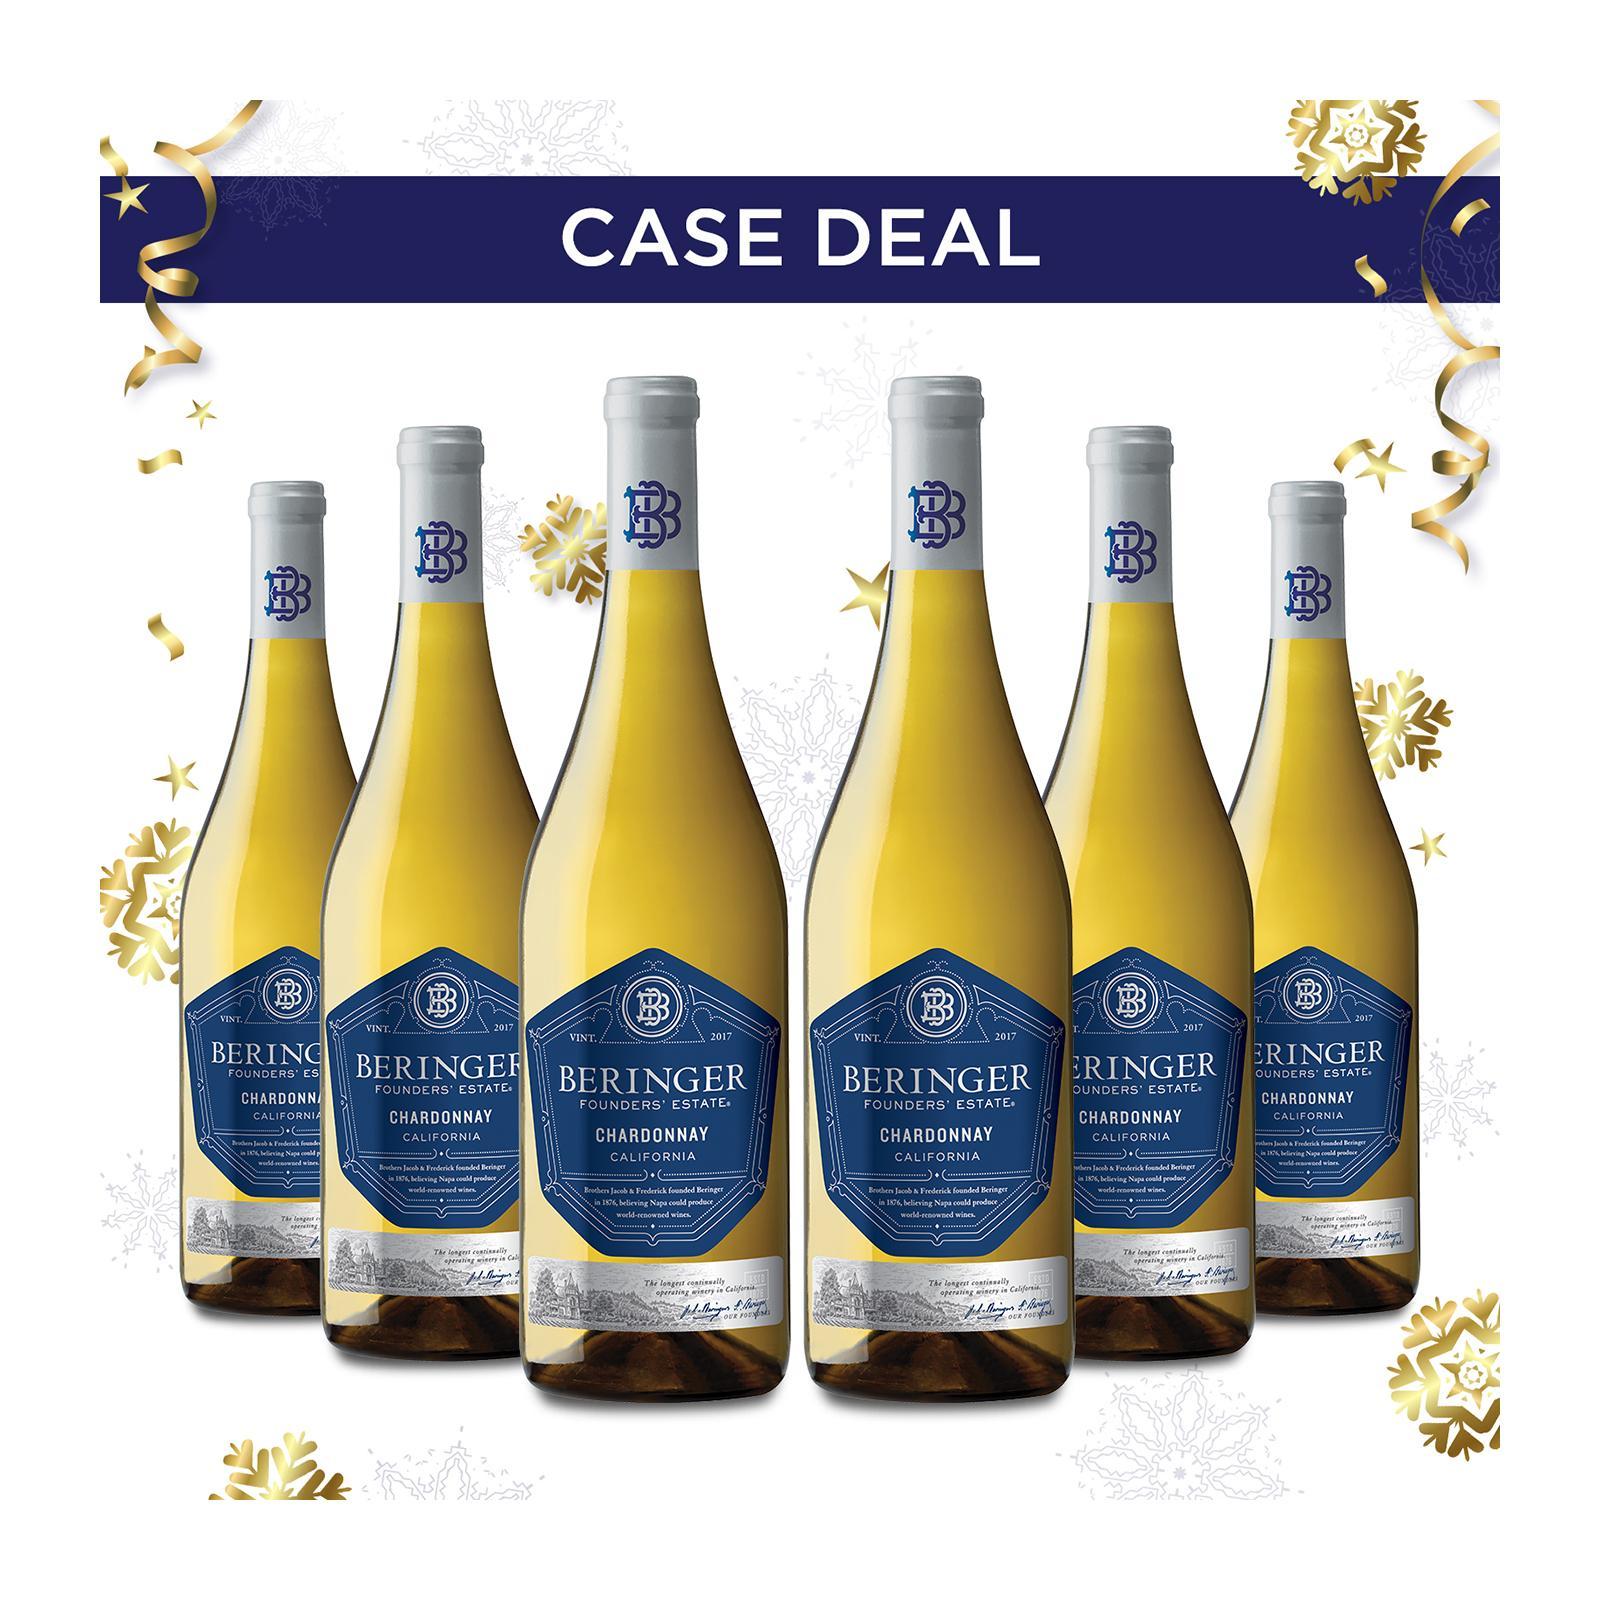 Beringer Founders Estate Chardonnay - Case